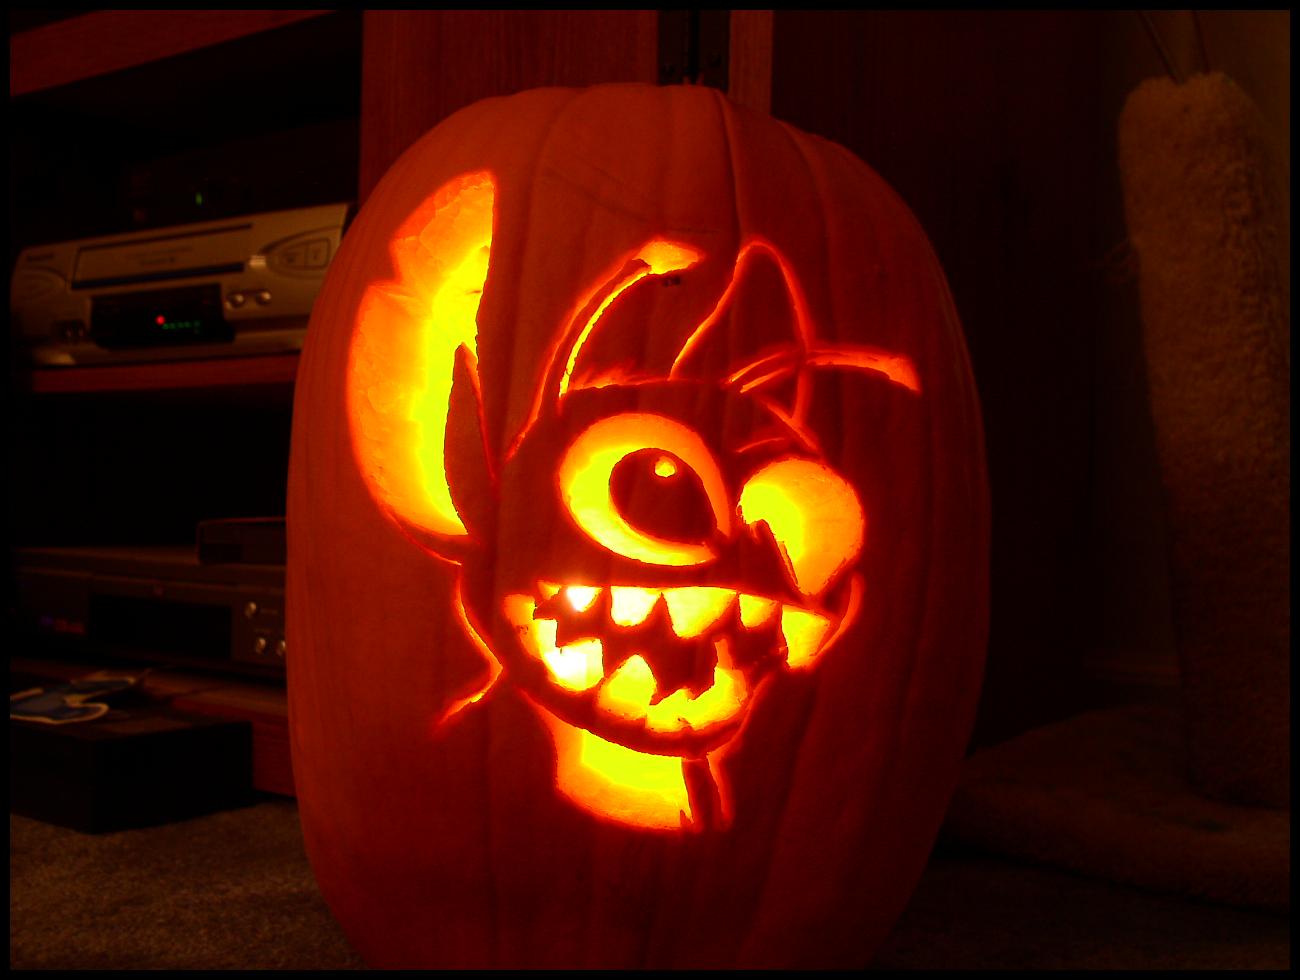 Stitch Pumpkin Carving - 5 Hrs by Experiment720 on DeviantArt